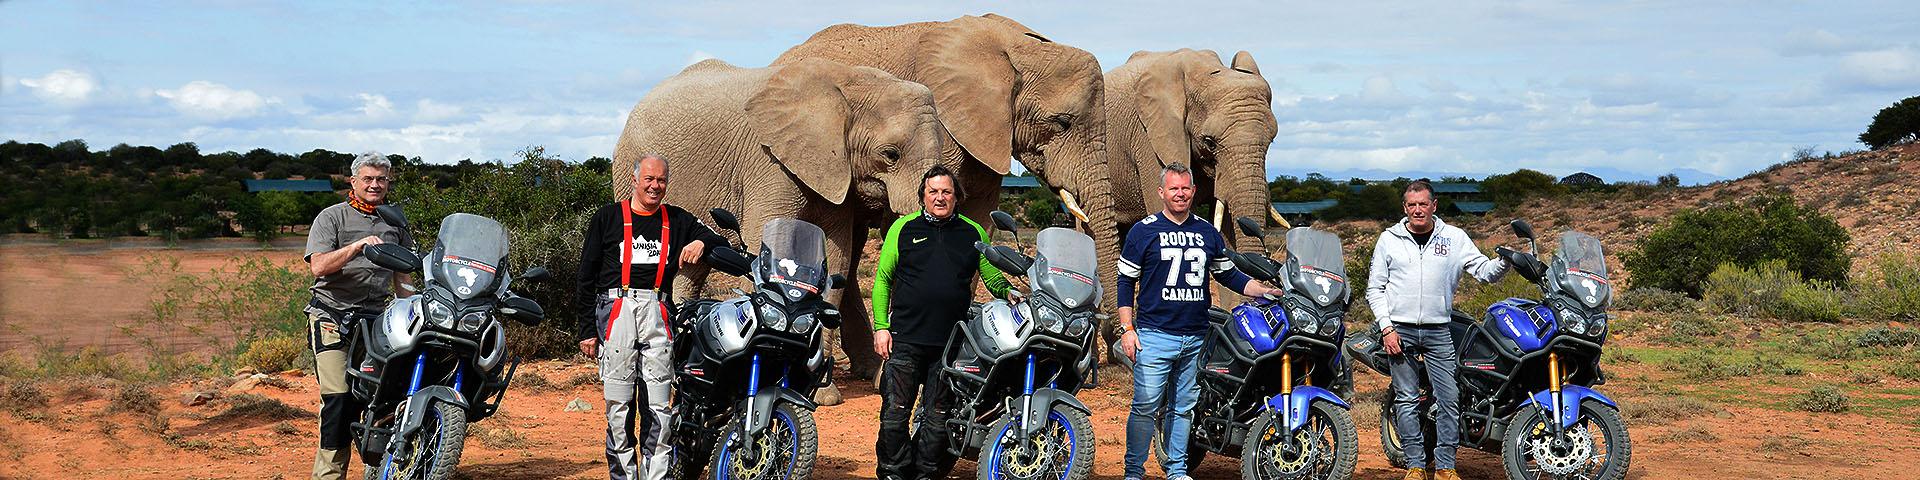 Experience Wild Africa